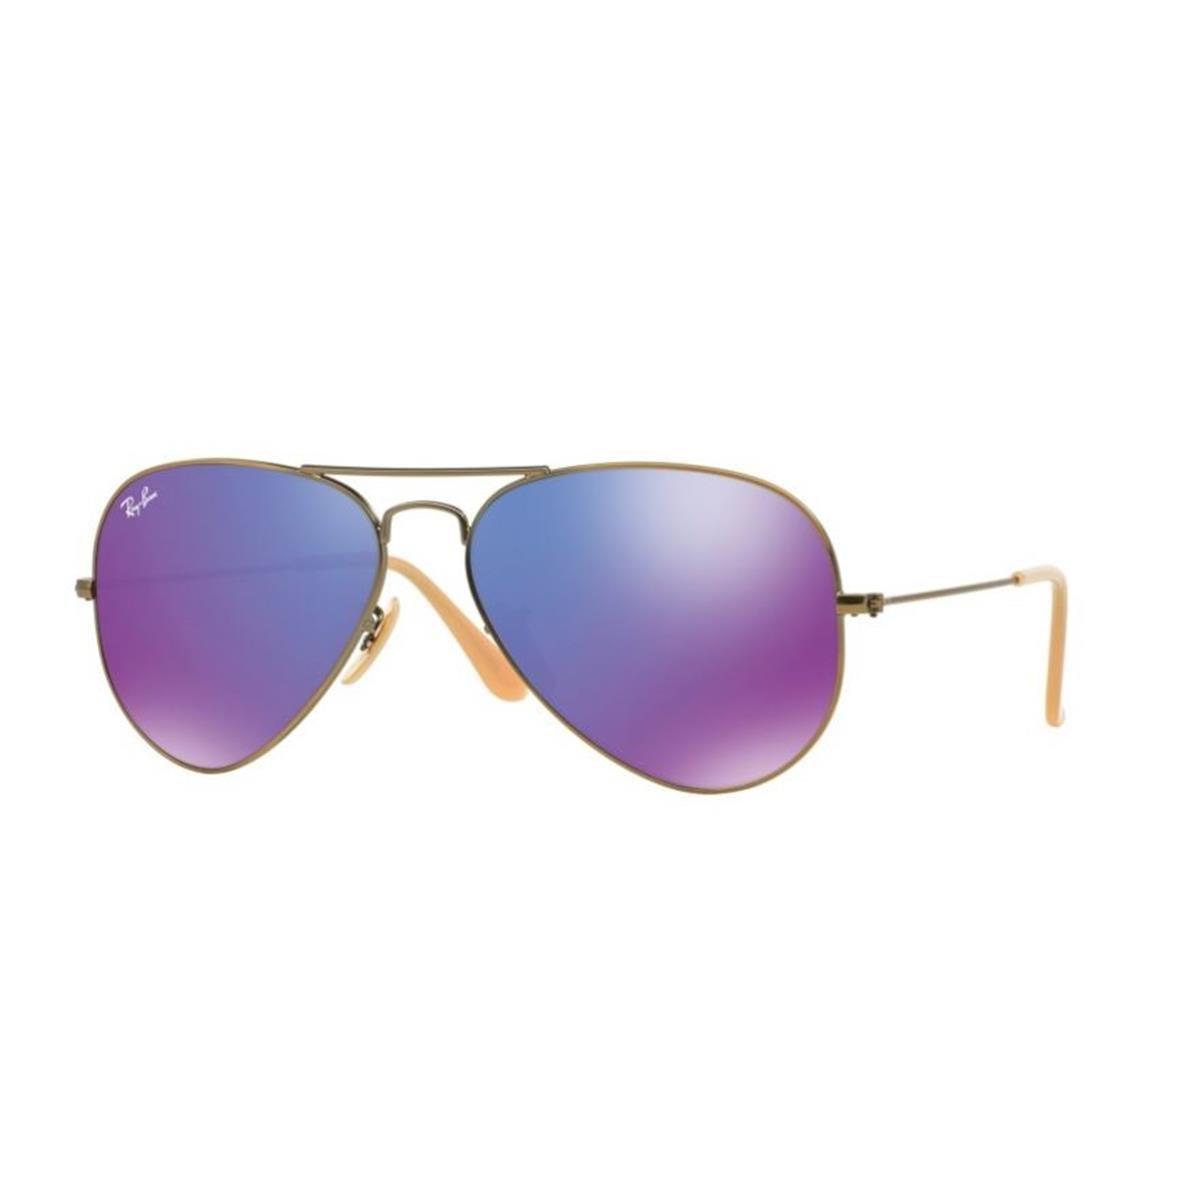 f6b79f1a19 Ray-Ban Aviator Large Metal Aviator Sunglasses